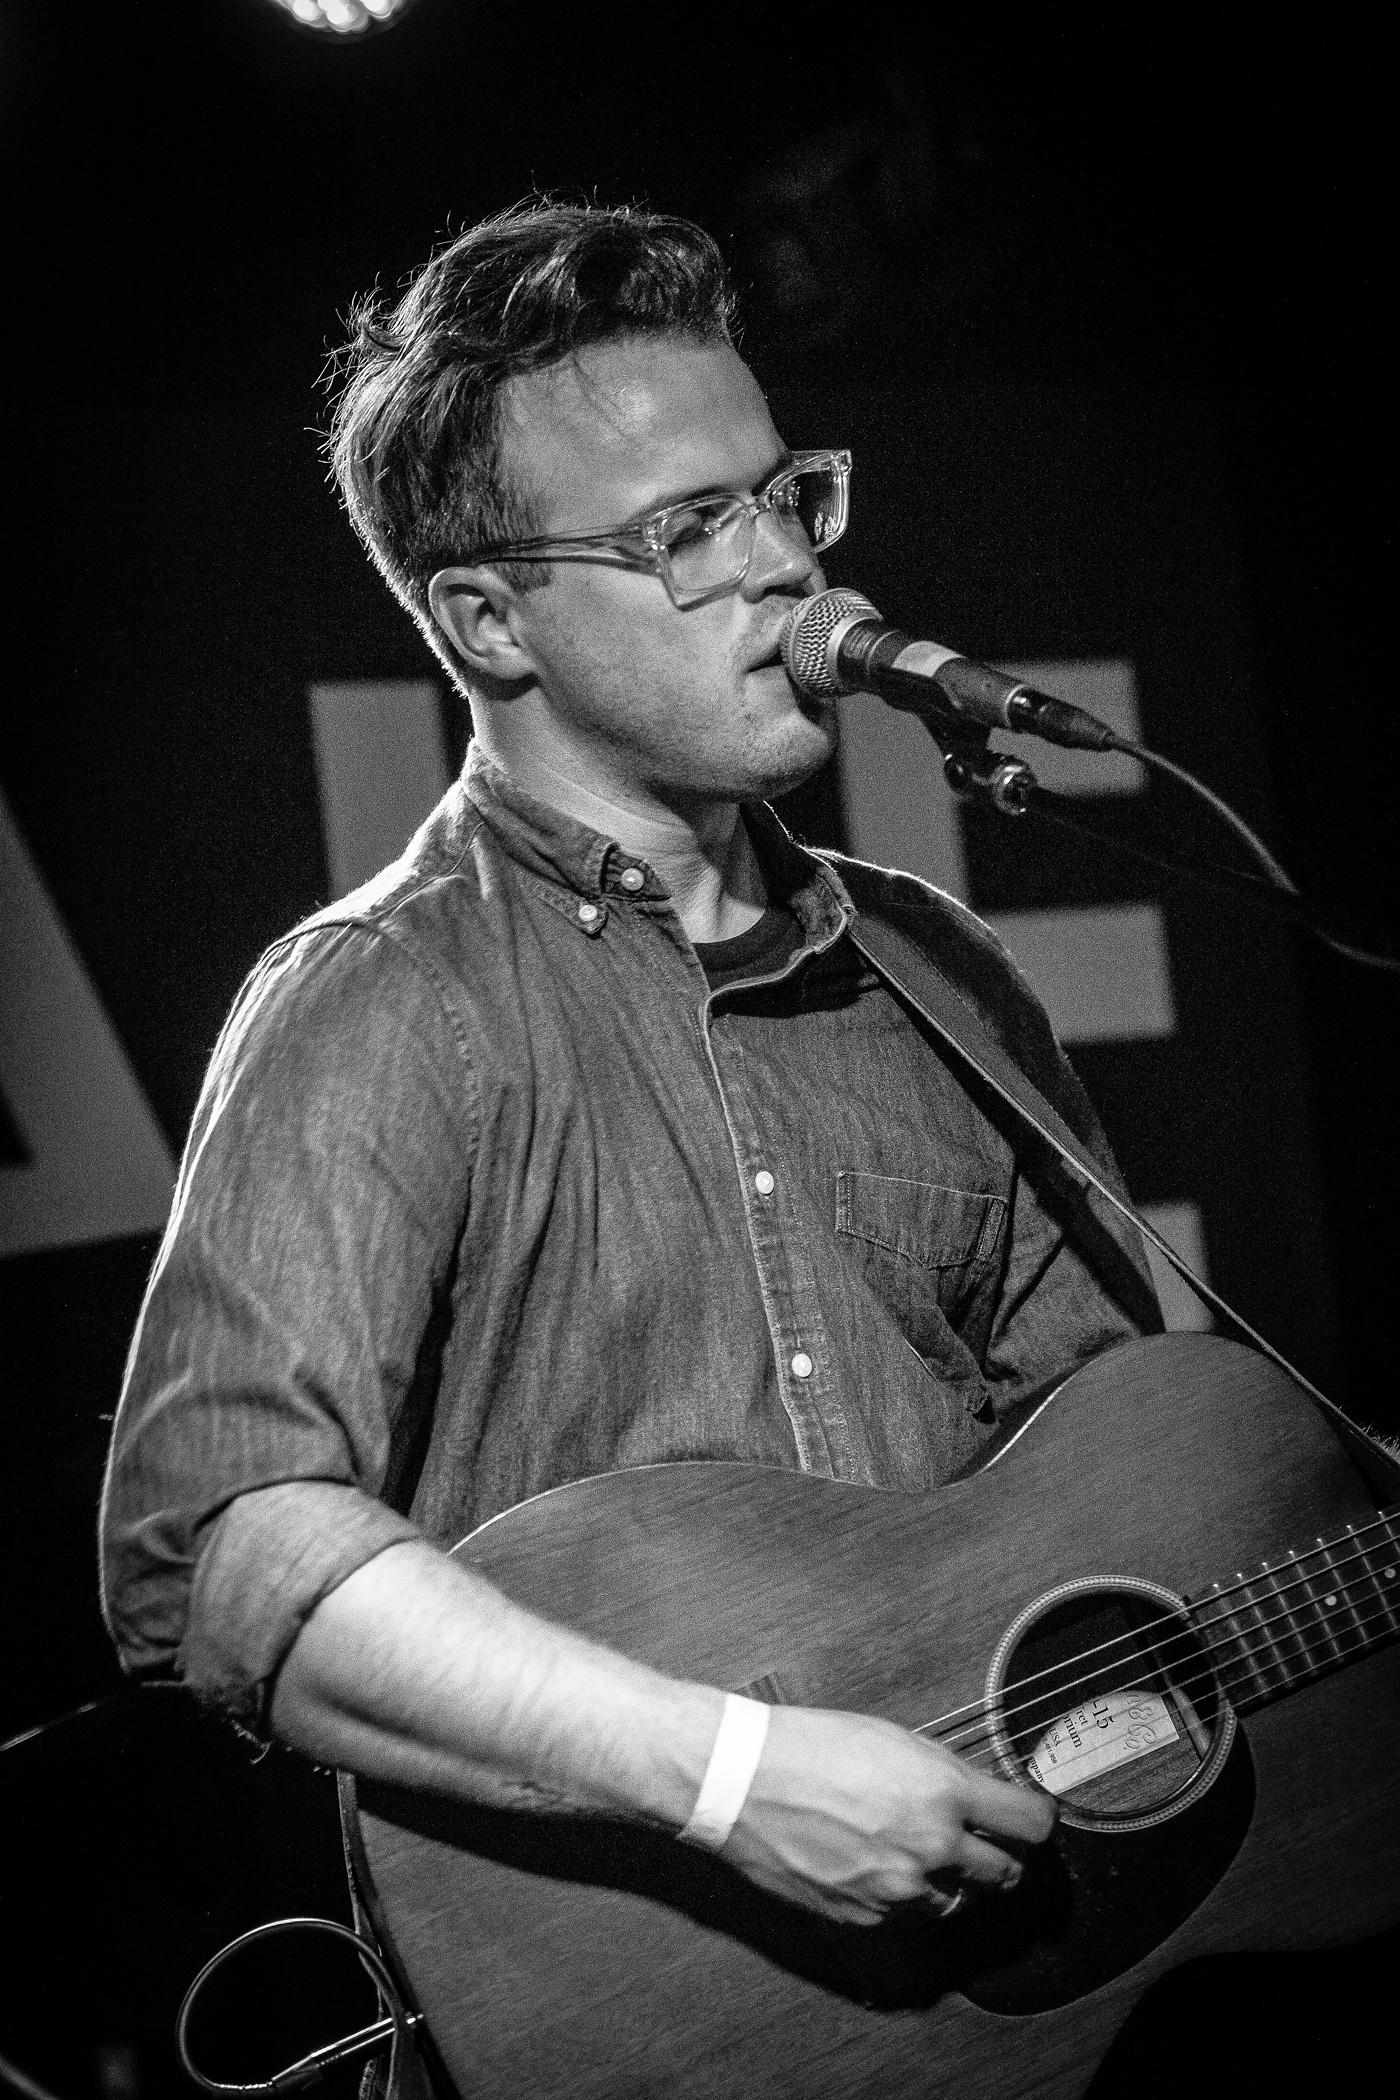 Ian Mahan Photos - Denver Singer Songwriter